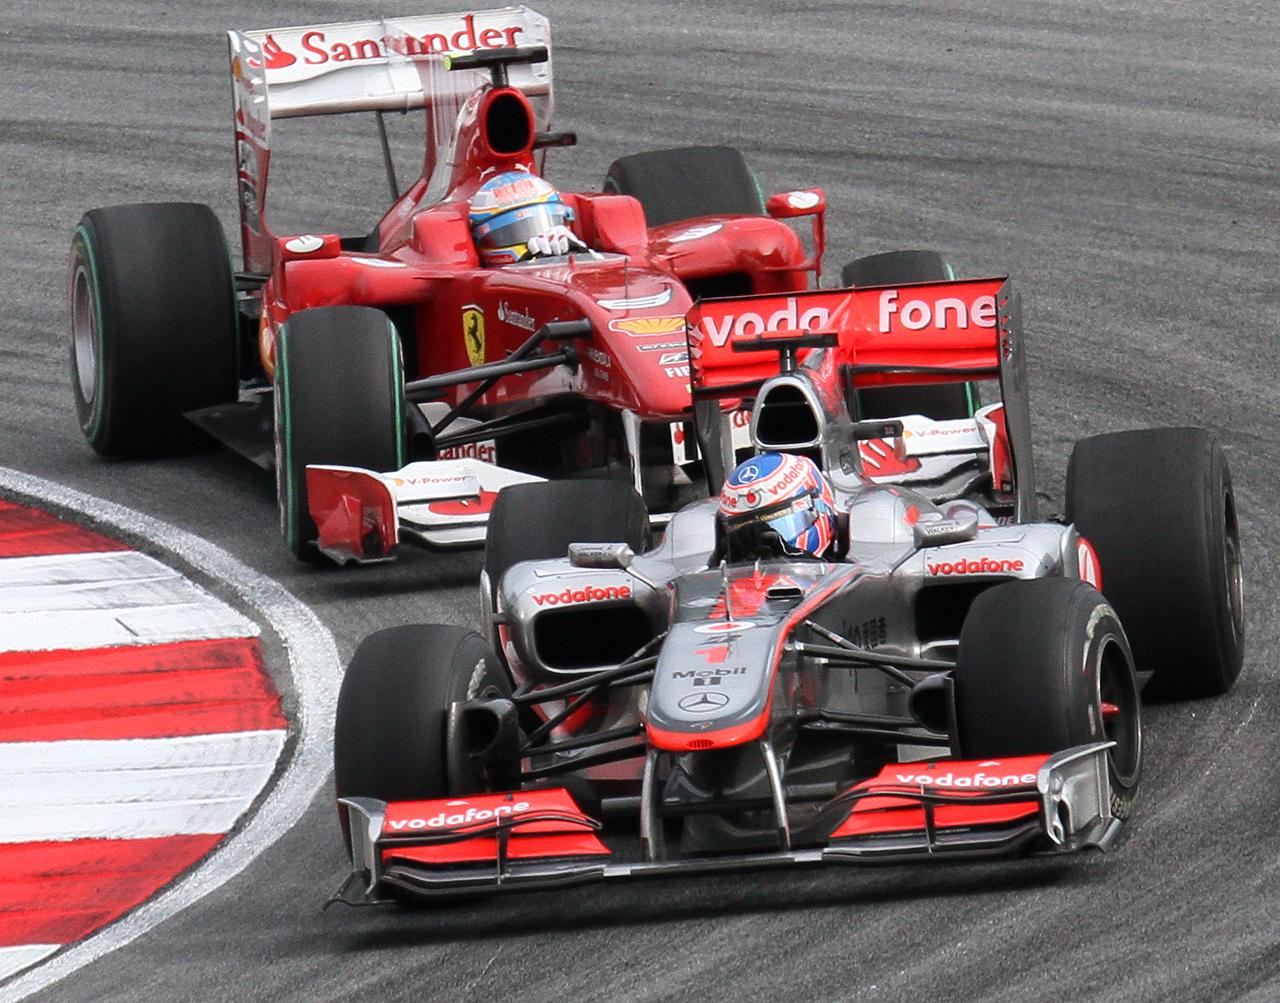 [Imagen: Jenson_Button_and_Fernando_Alonso_2010_Malaysia.jpg]